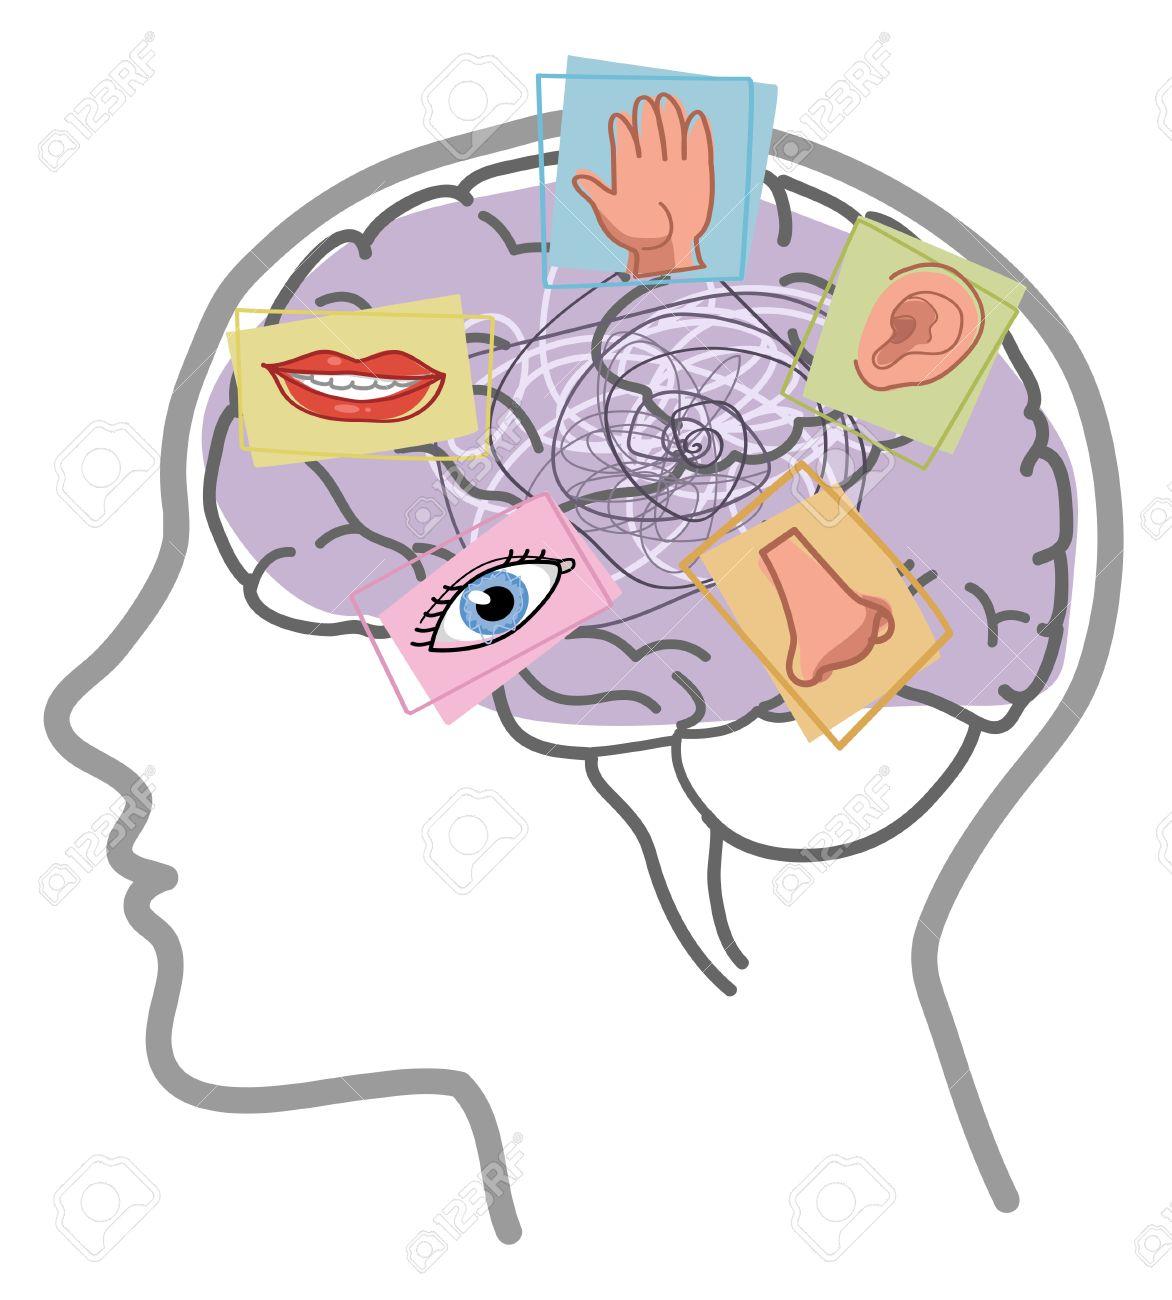 Human brain disorder vector 5 senses - 72861479